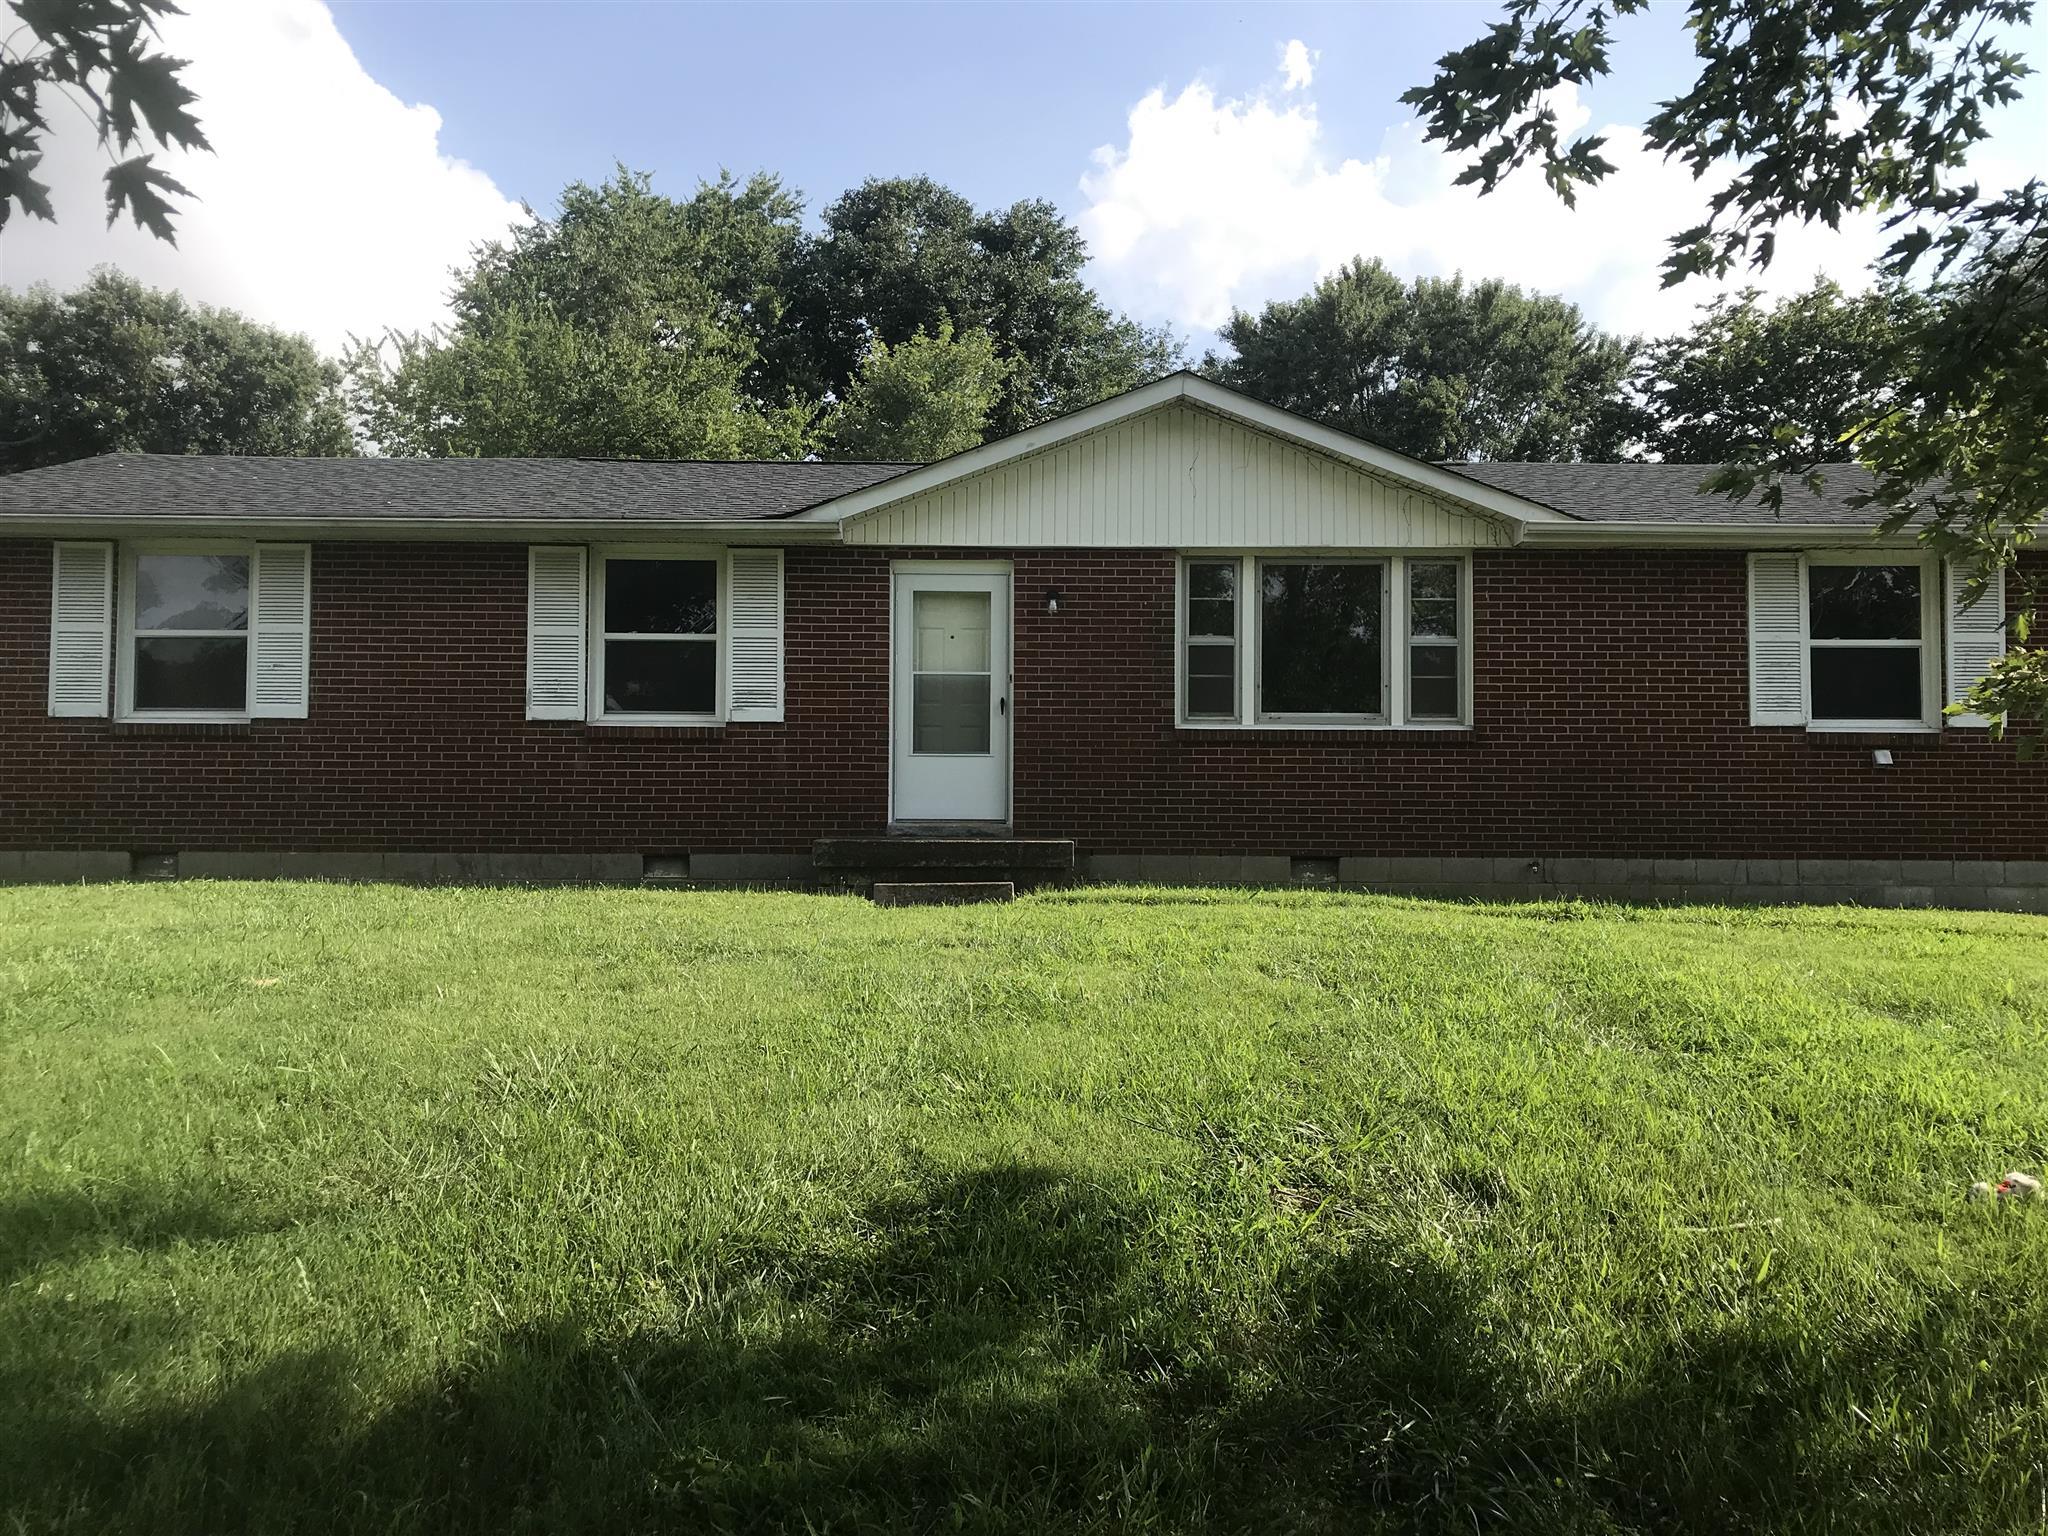 208 Jackson Rd, Clarksville, TN 37042 - Clarksville, TN real estate listing